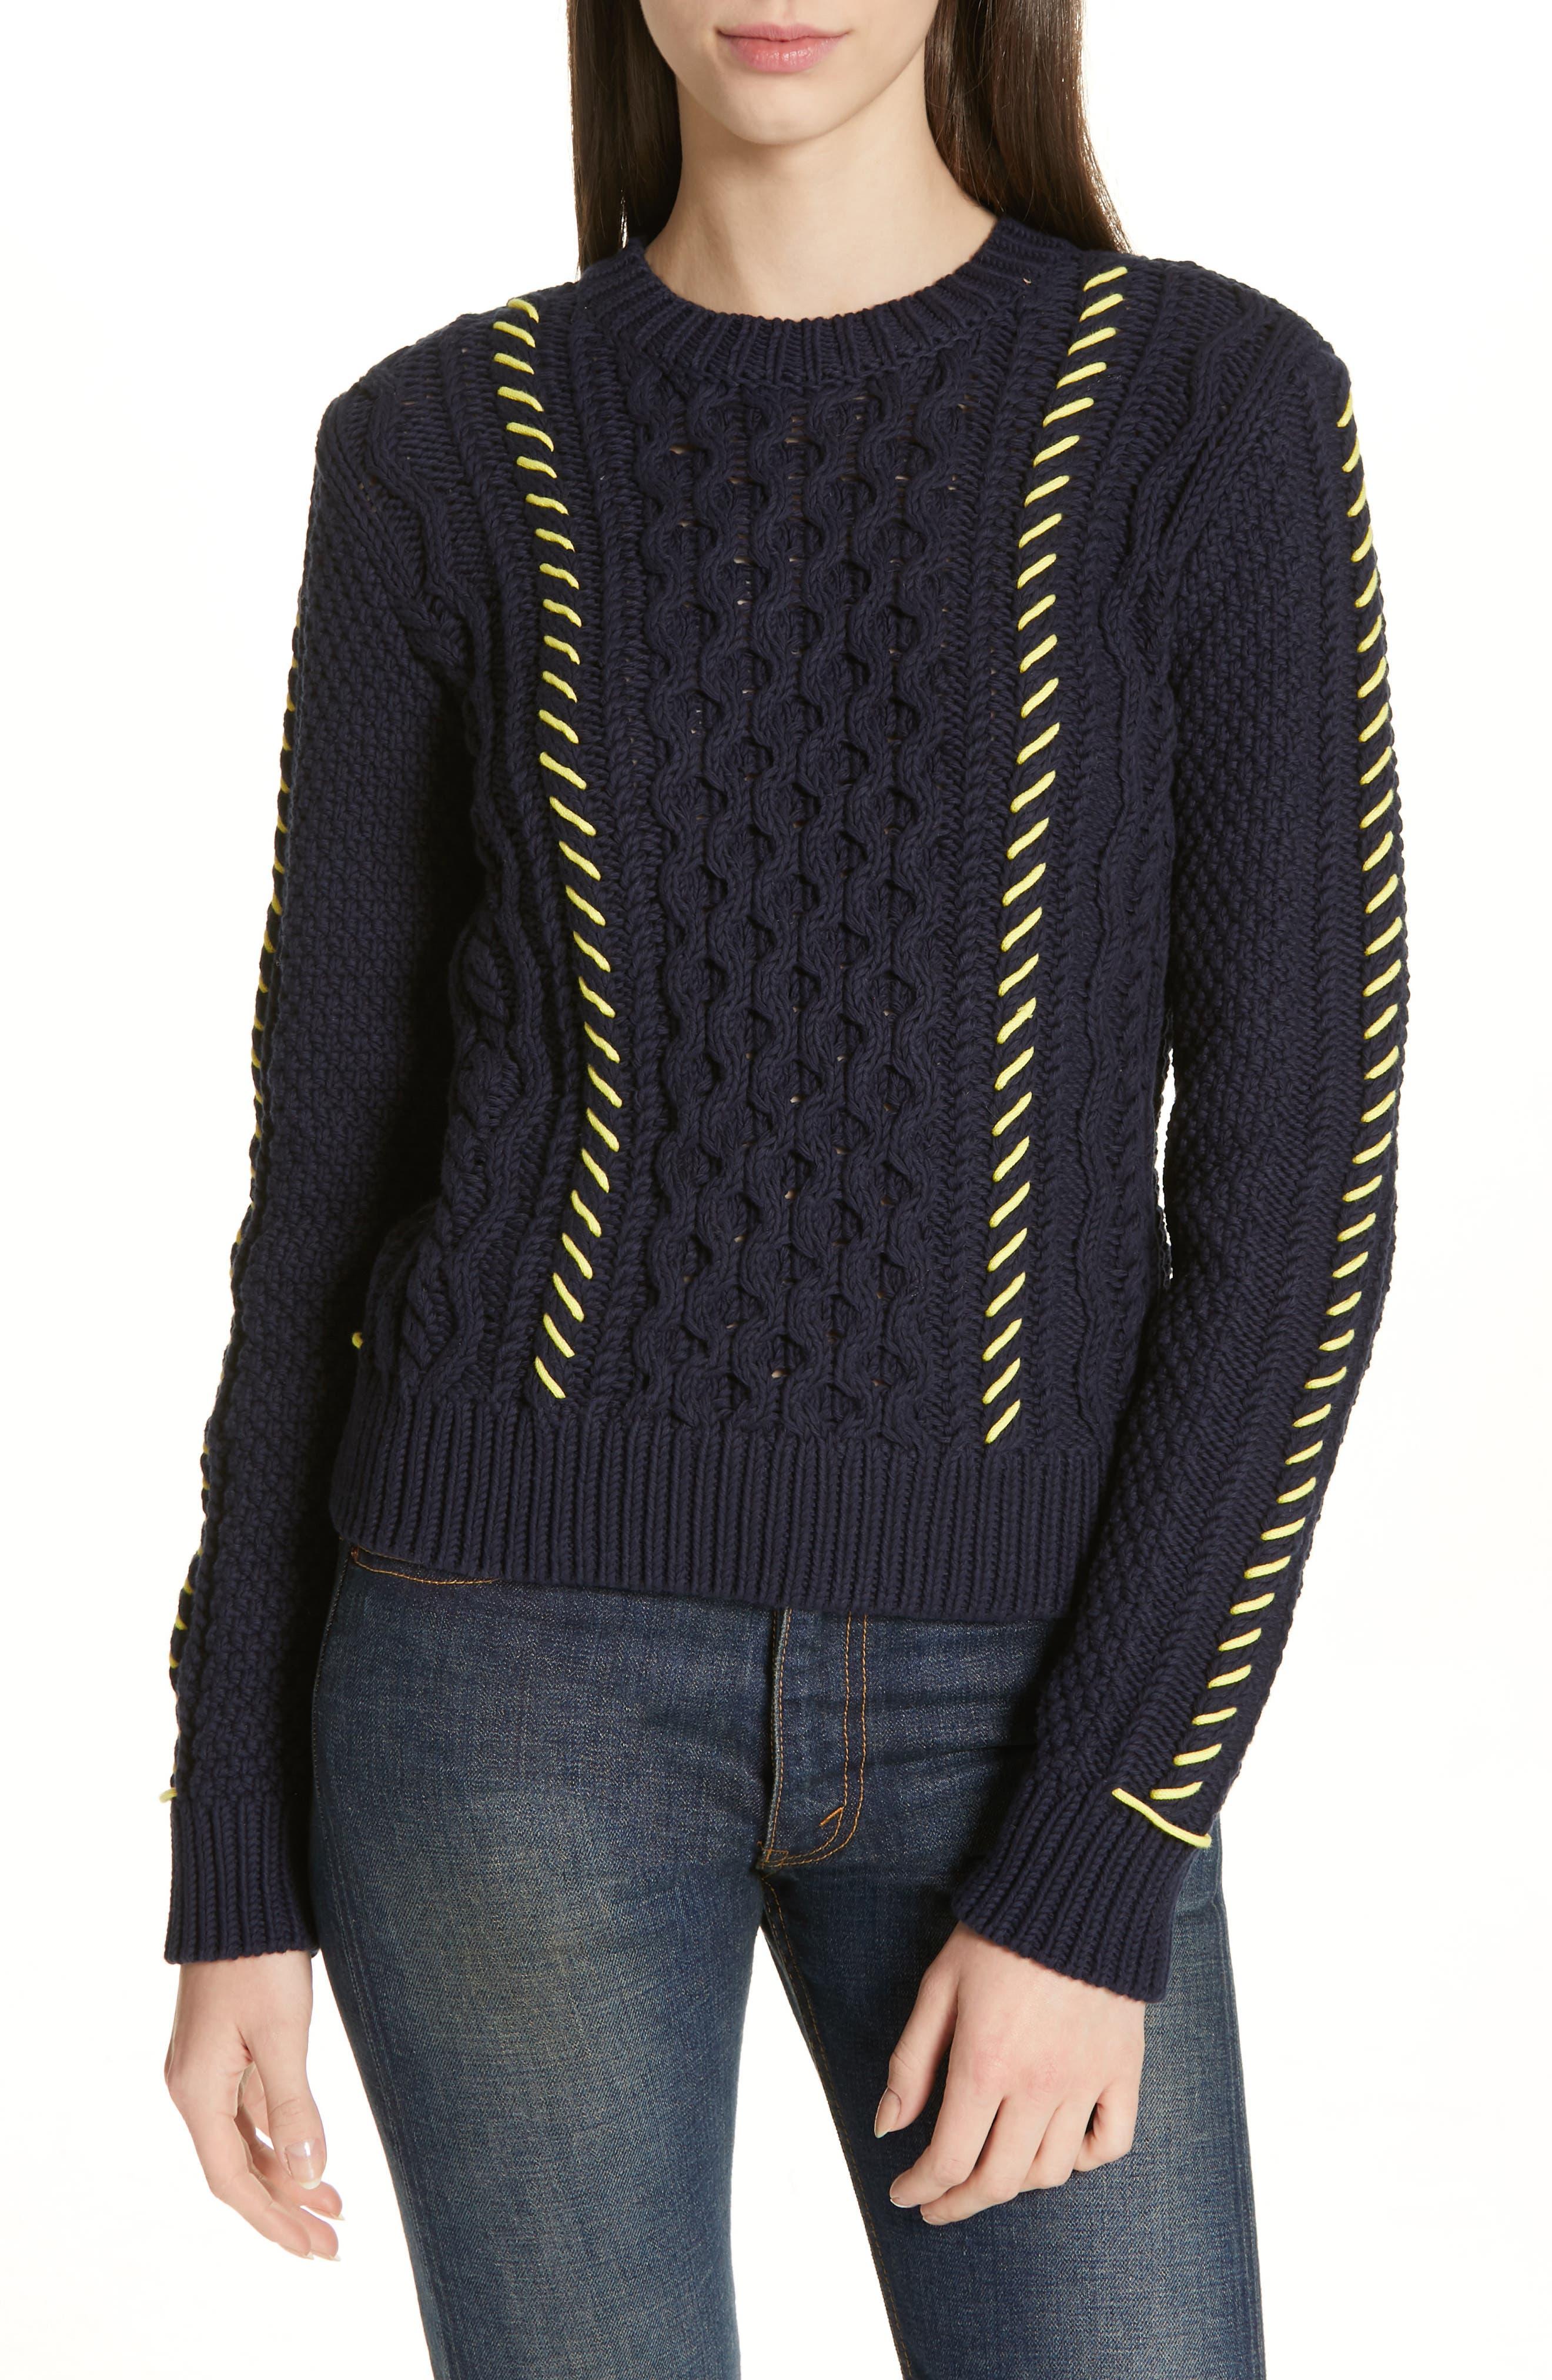 LA LIGNE Cotton Fisherman Sweater in Navy Yellow